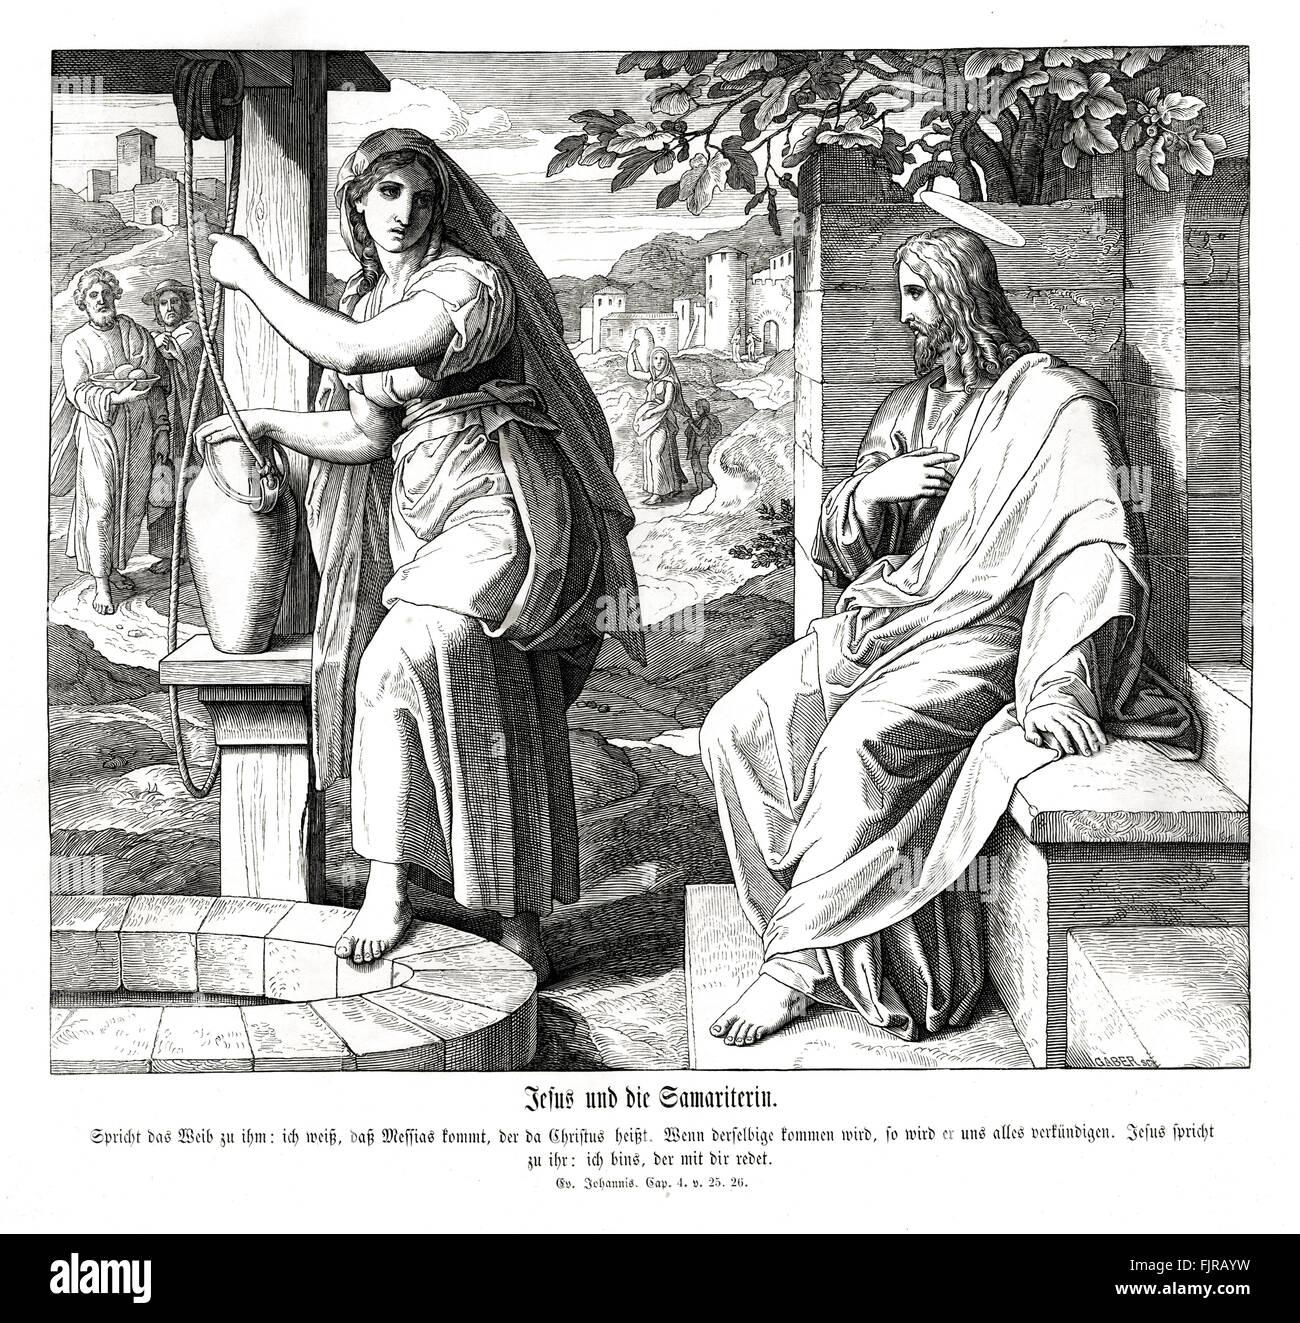 Jesus and the Samaritan woman, Gospel of John chapter IV verses 25 - 26 'The woman saith unto him, I know that - Stock Image